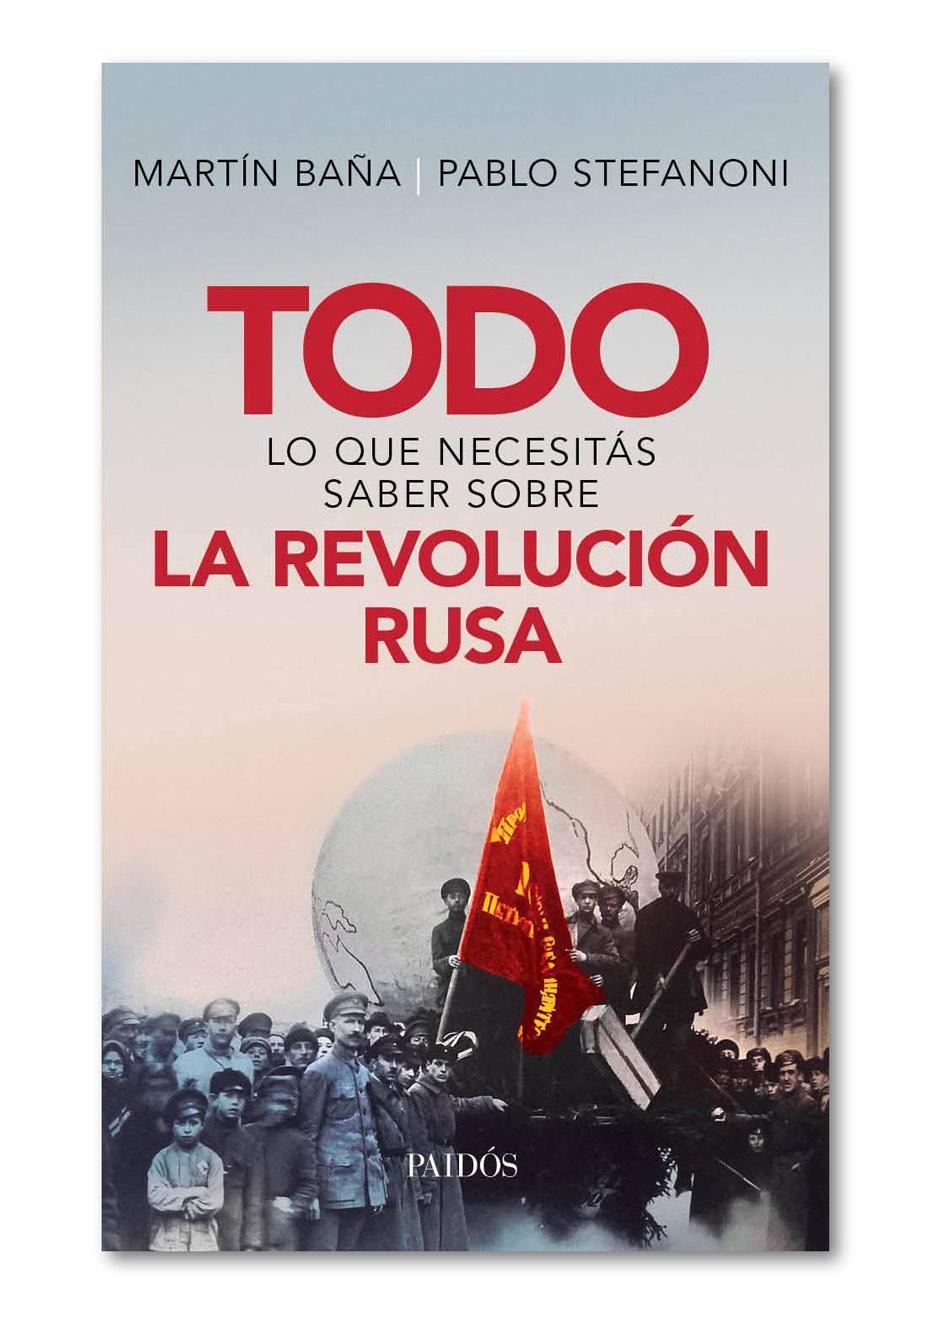 Revolucion-rusa-de-Putin_02_der